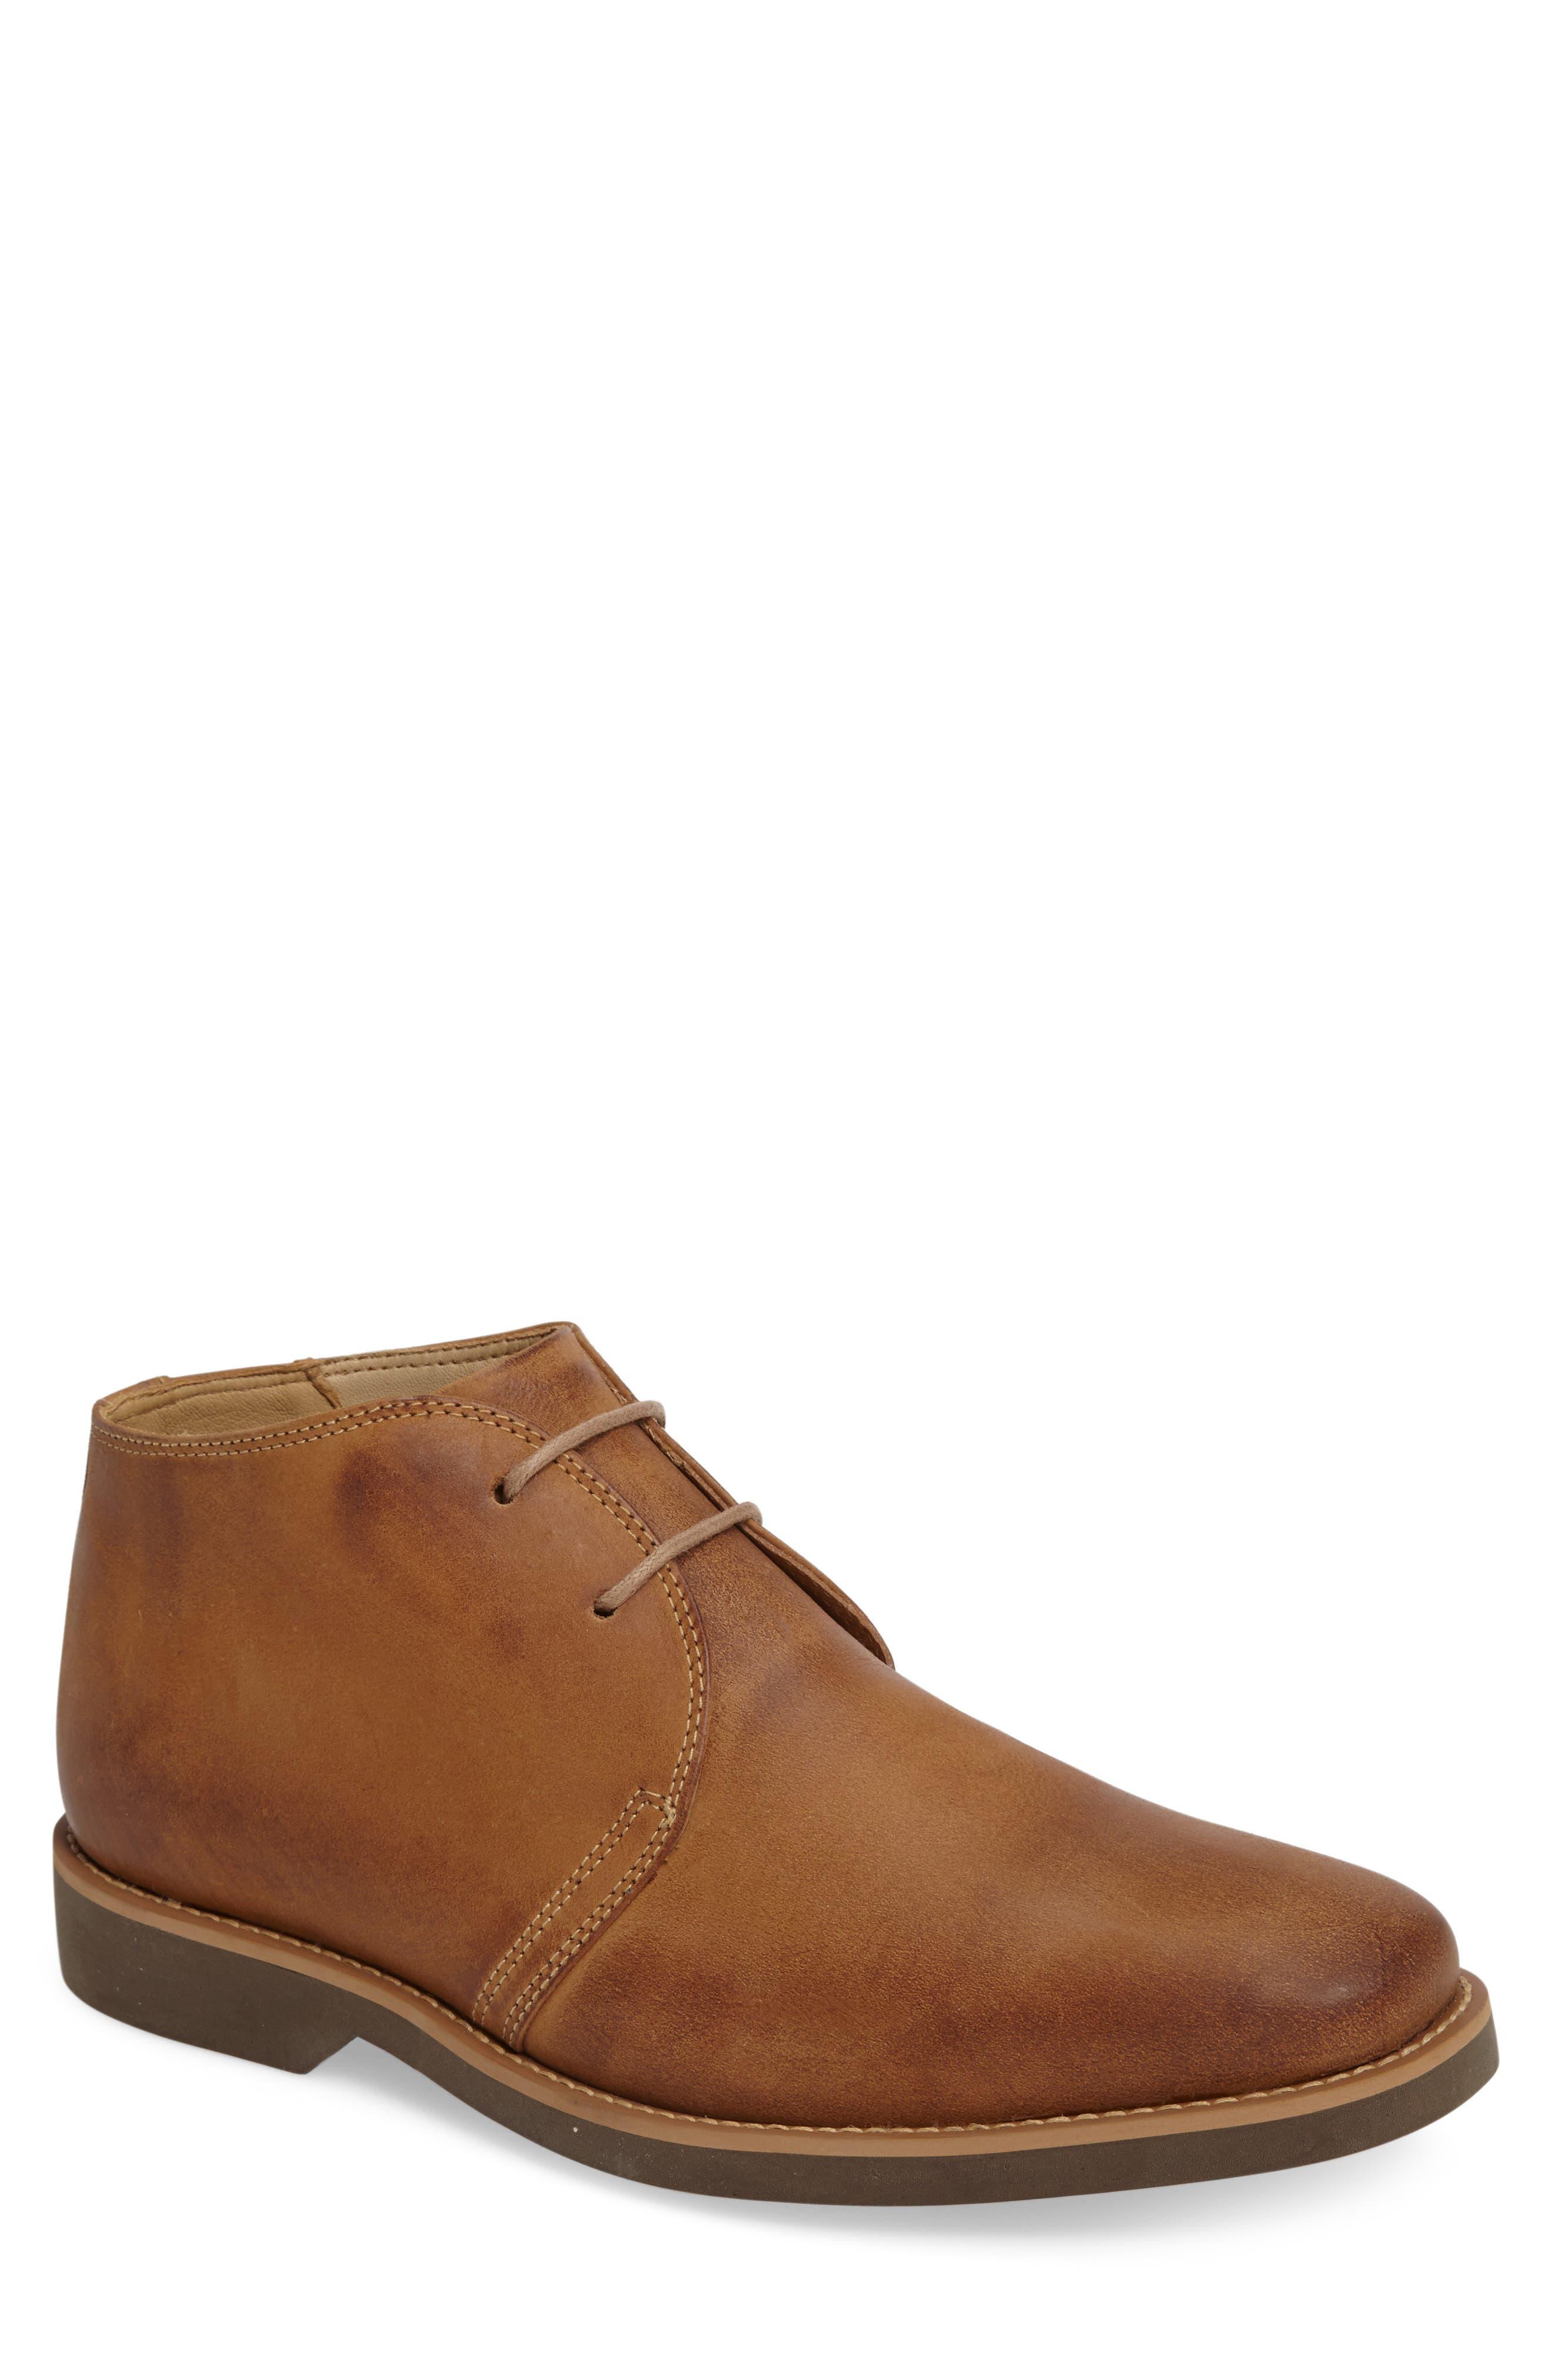 Main Image - Anatomic & Co 'Colorado' Chukka Boot (Men)